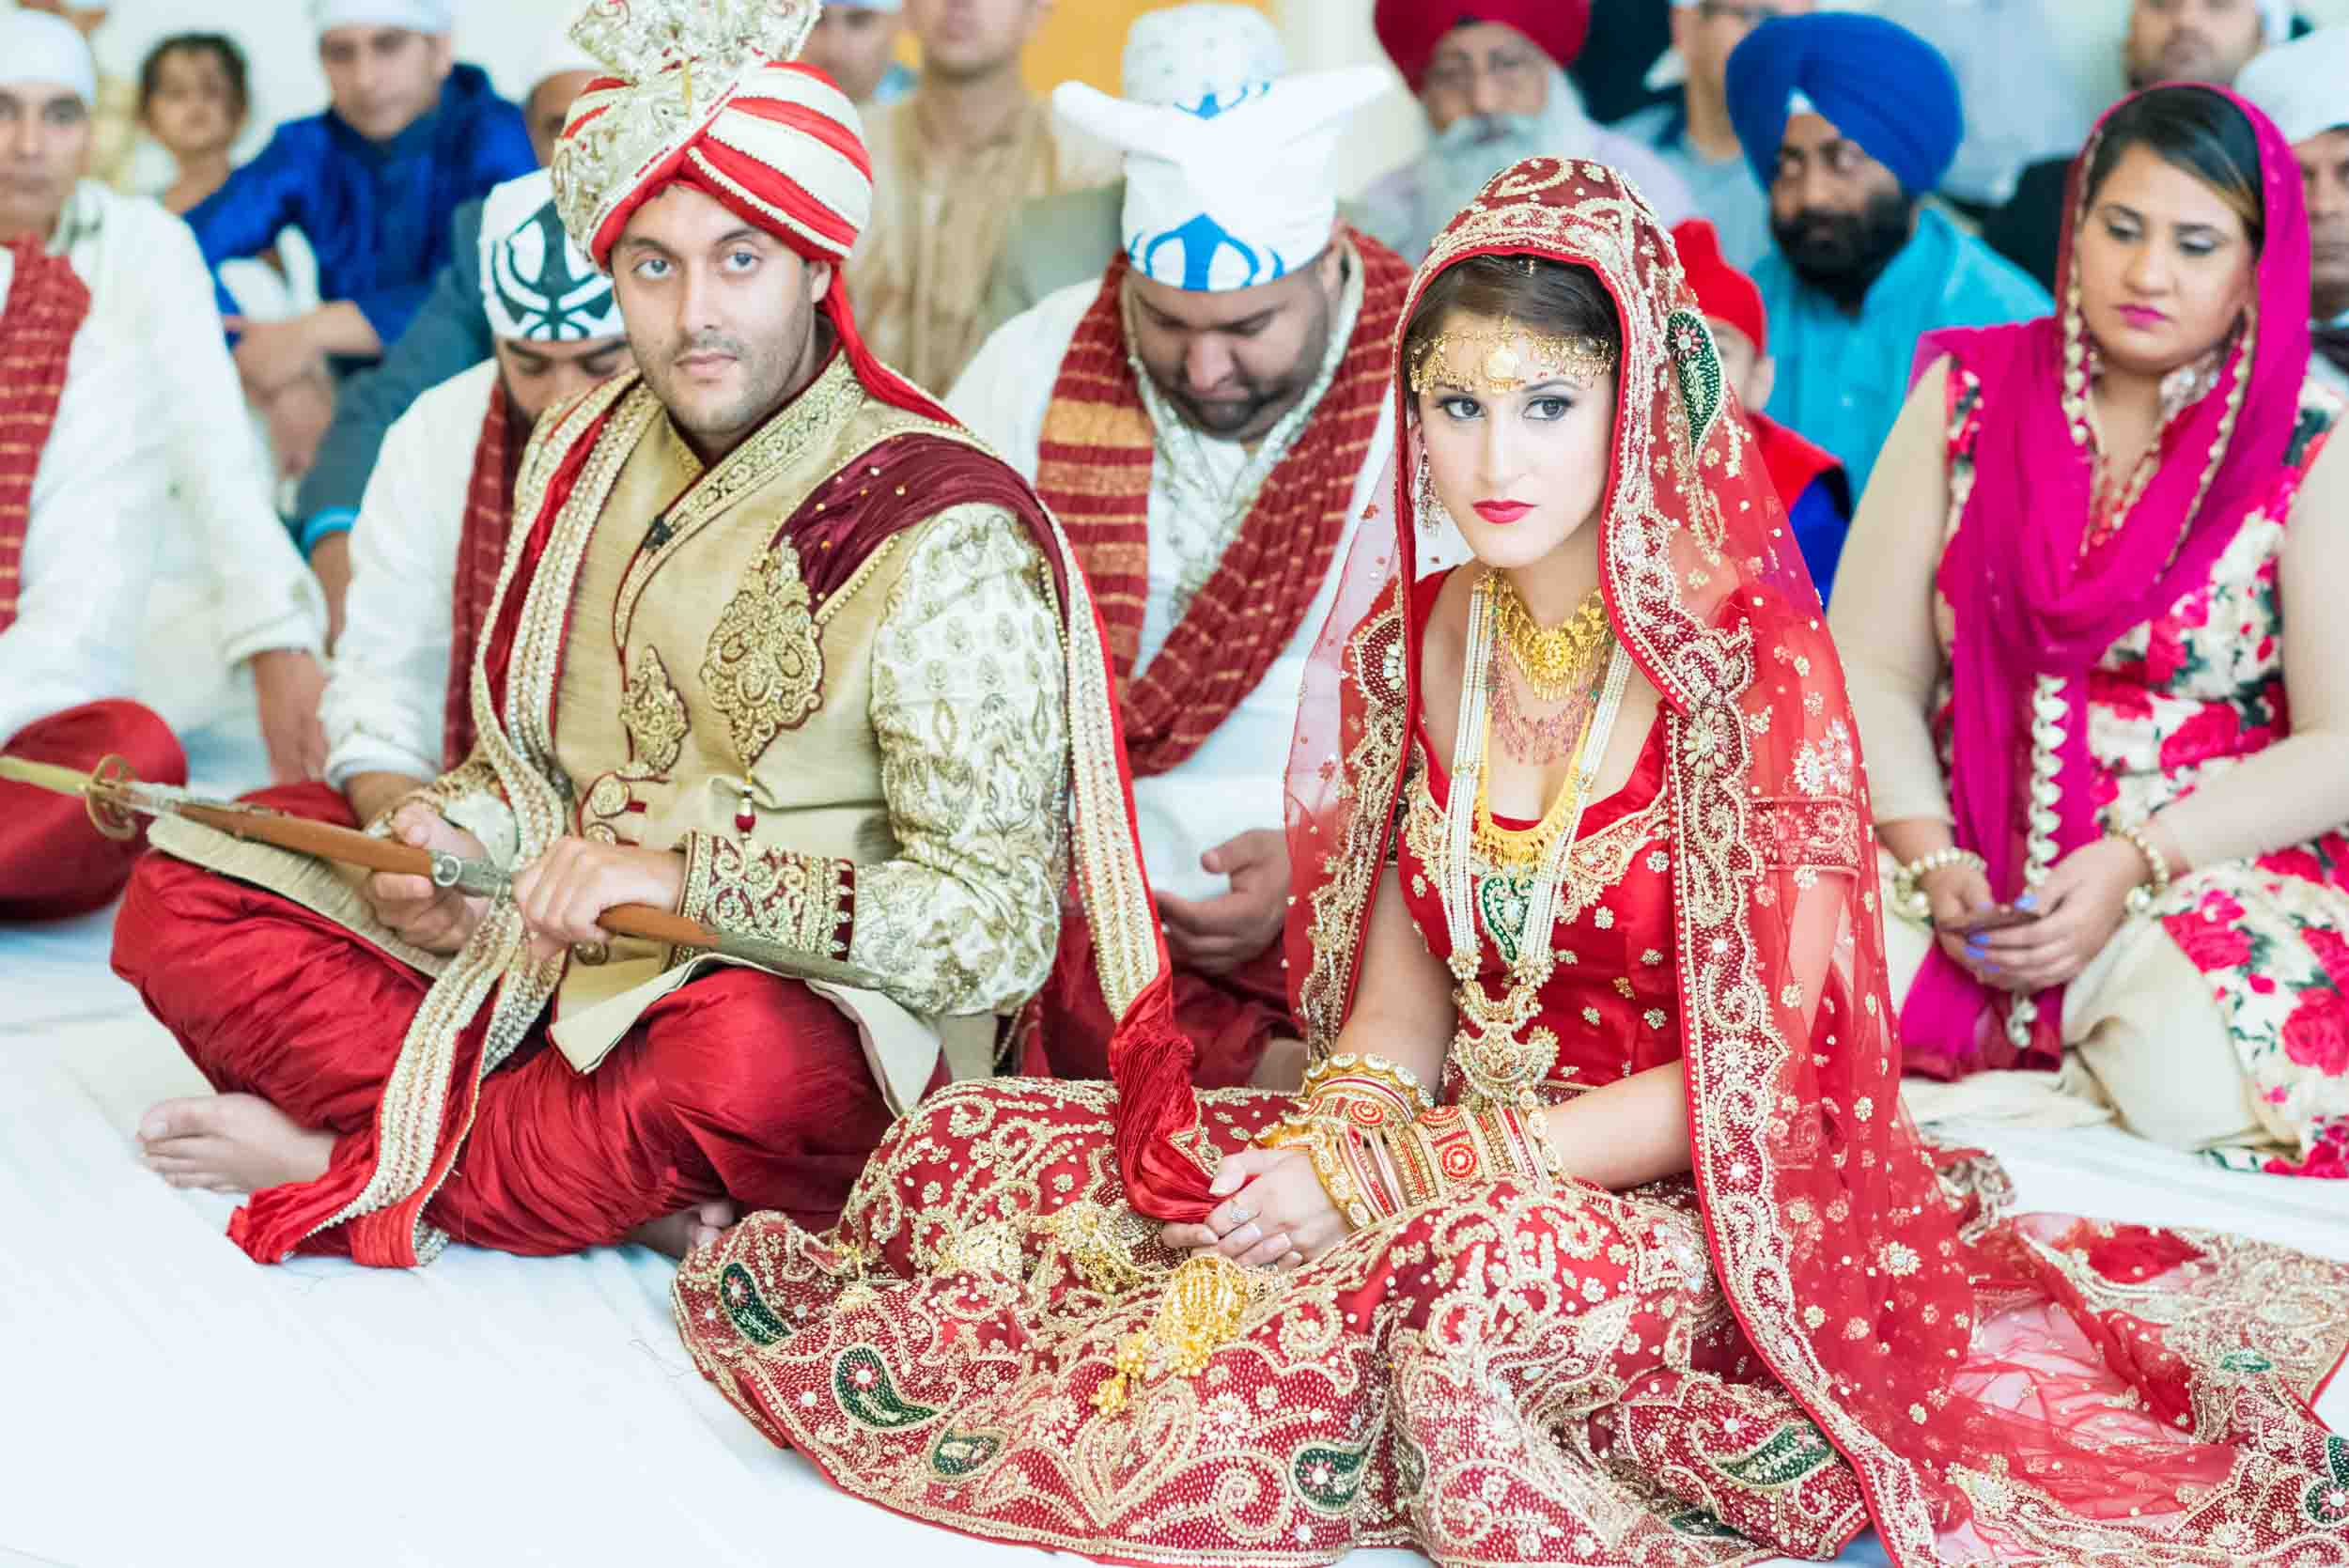 dc+metro+wedding+photographer+vadym+guliuk+photography+wedding+ceremony-2036.jpg